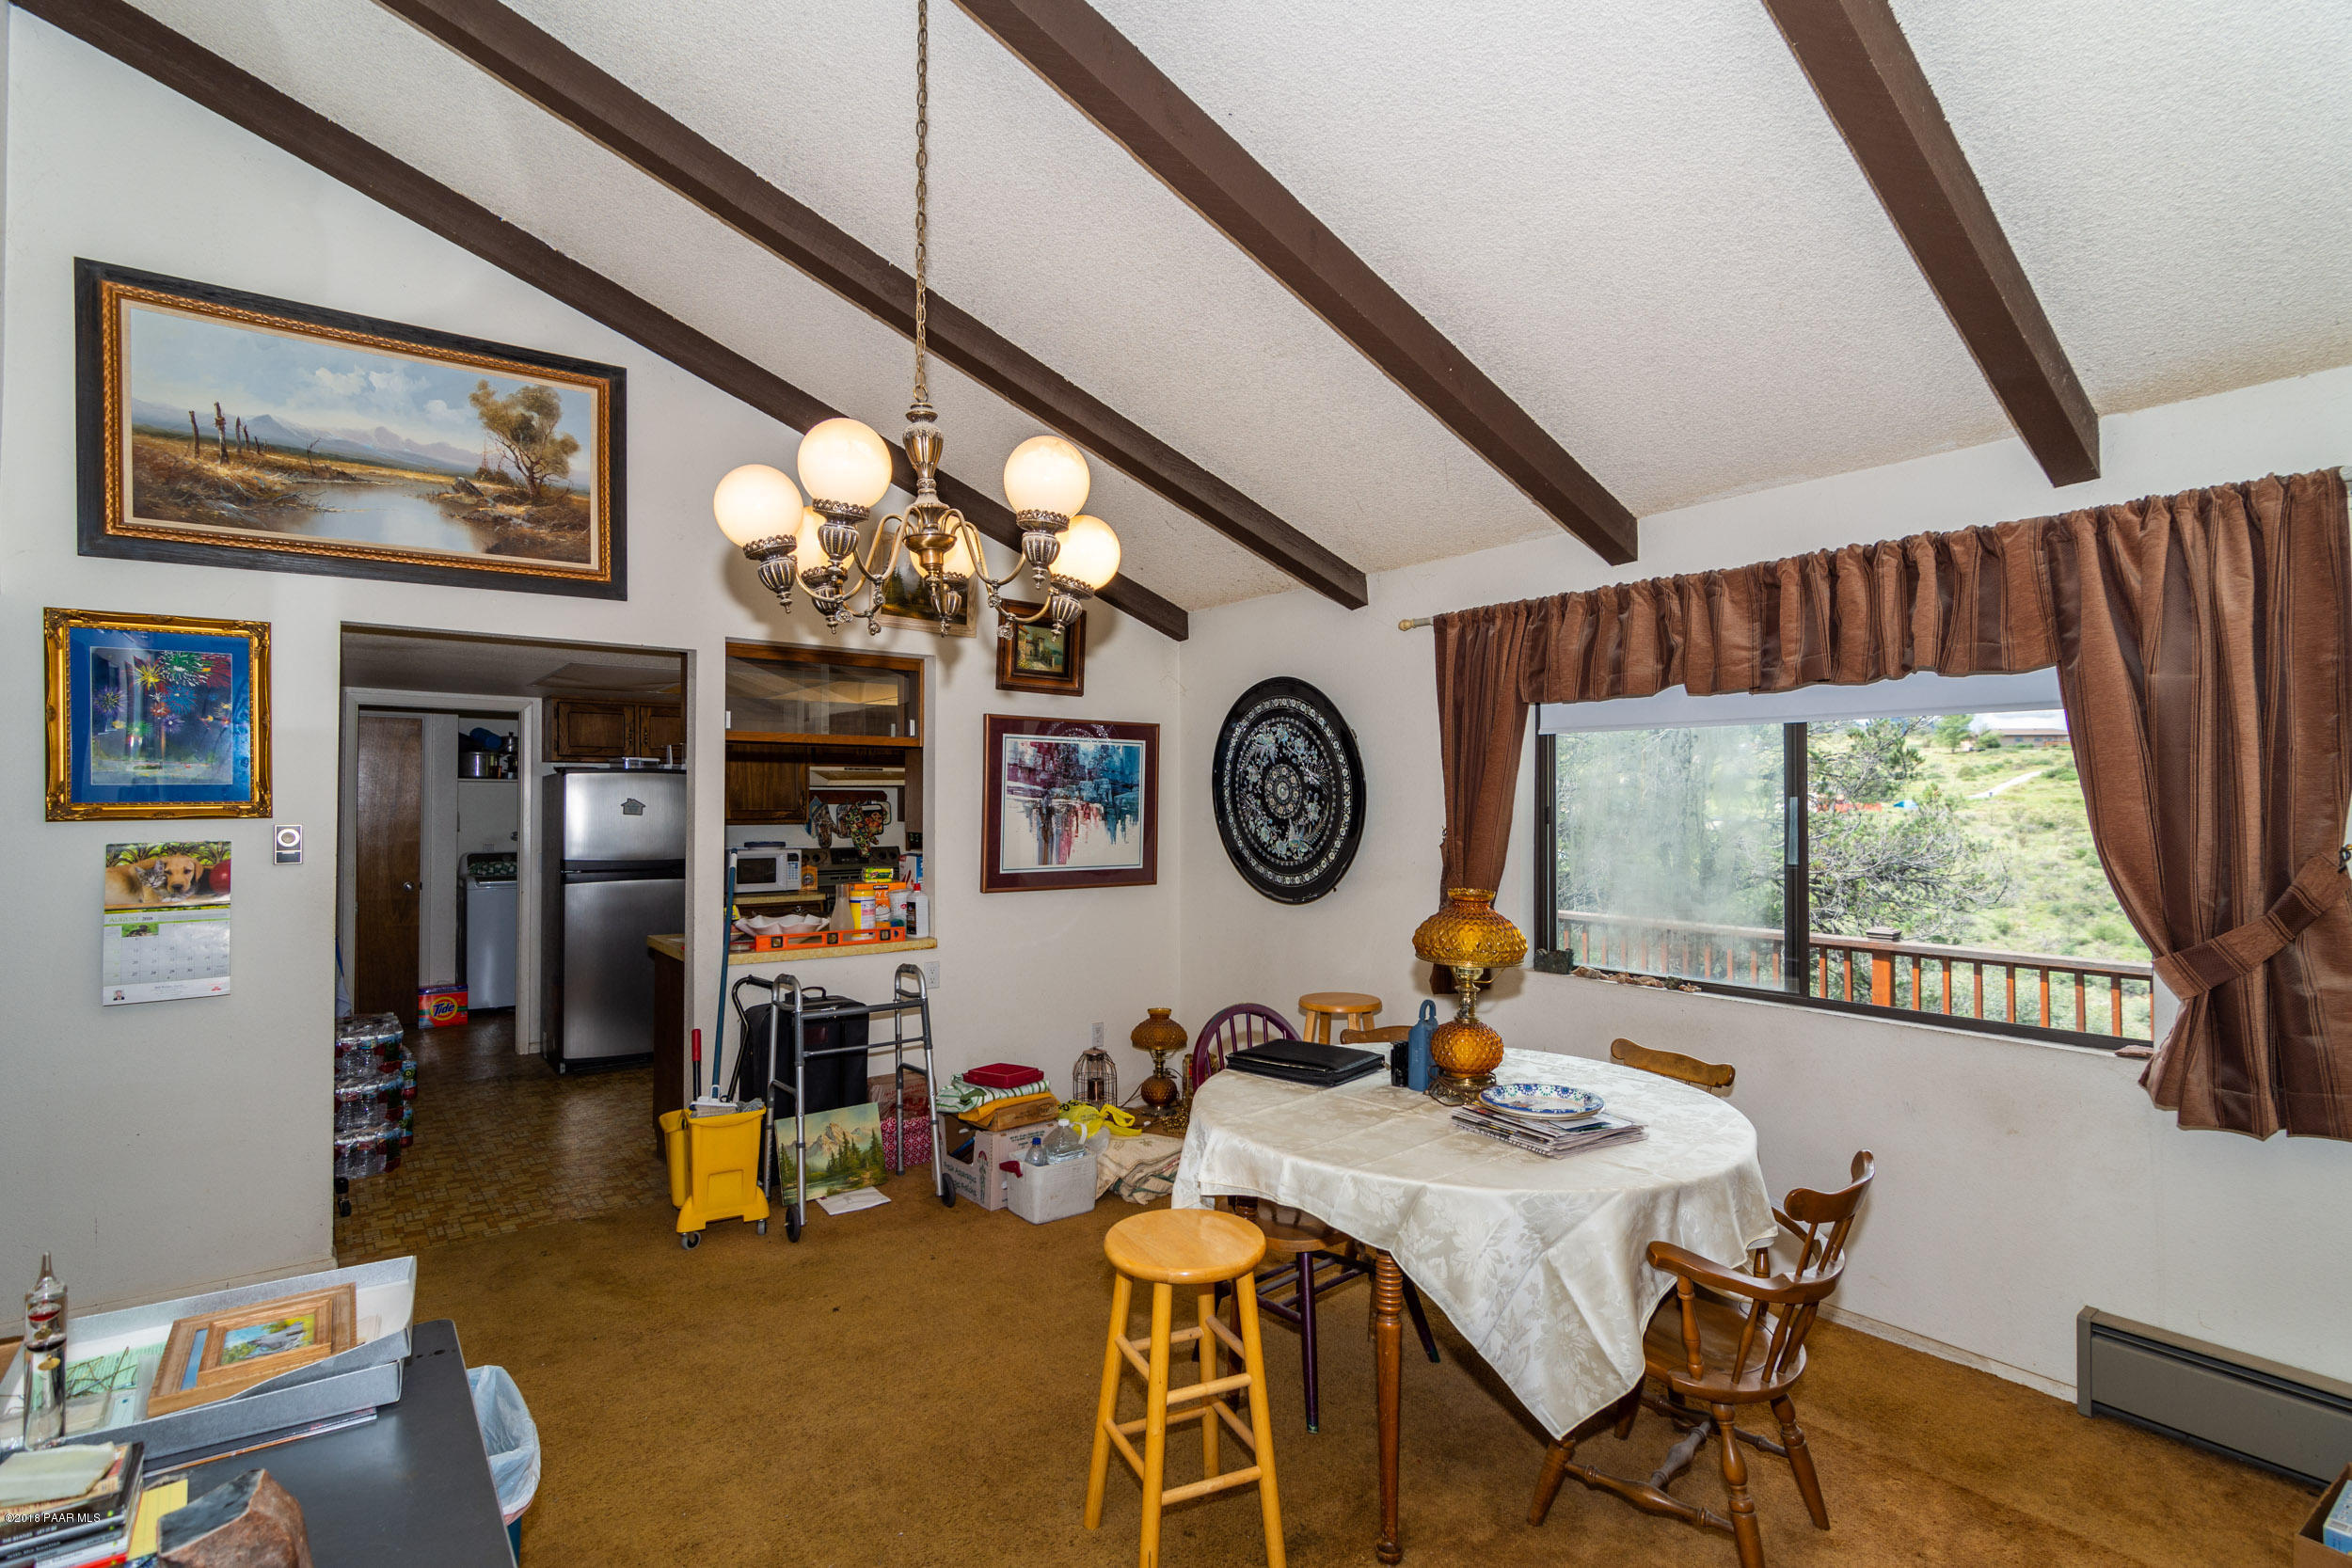 1764 Buena Vista Trail Prescott, AZ 86305 - MLS #: 1014891